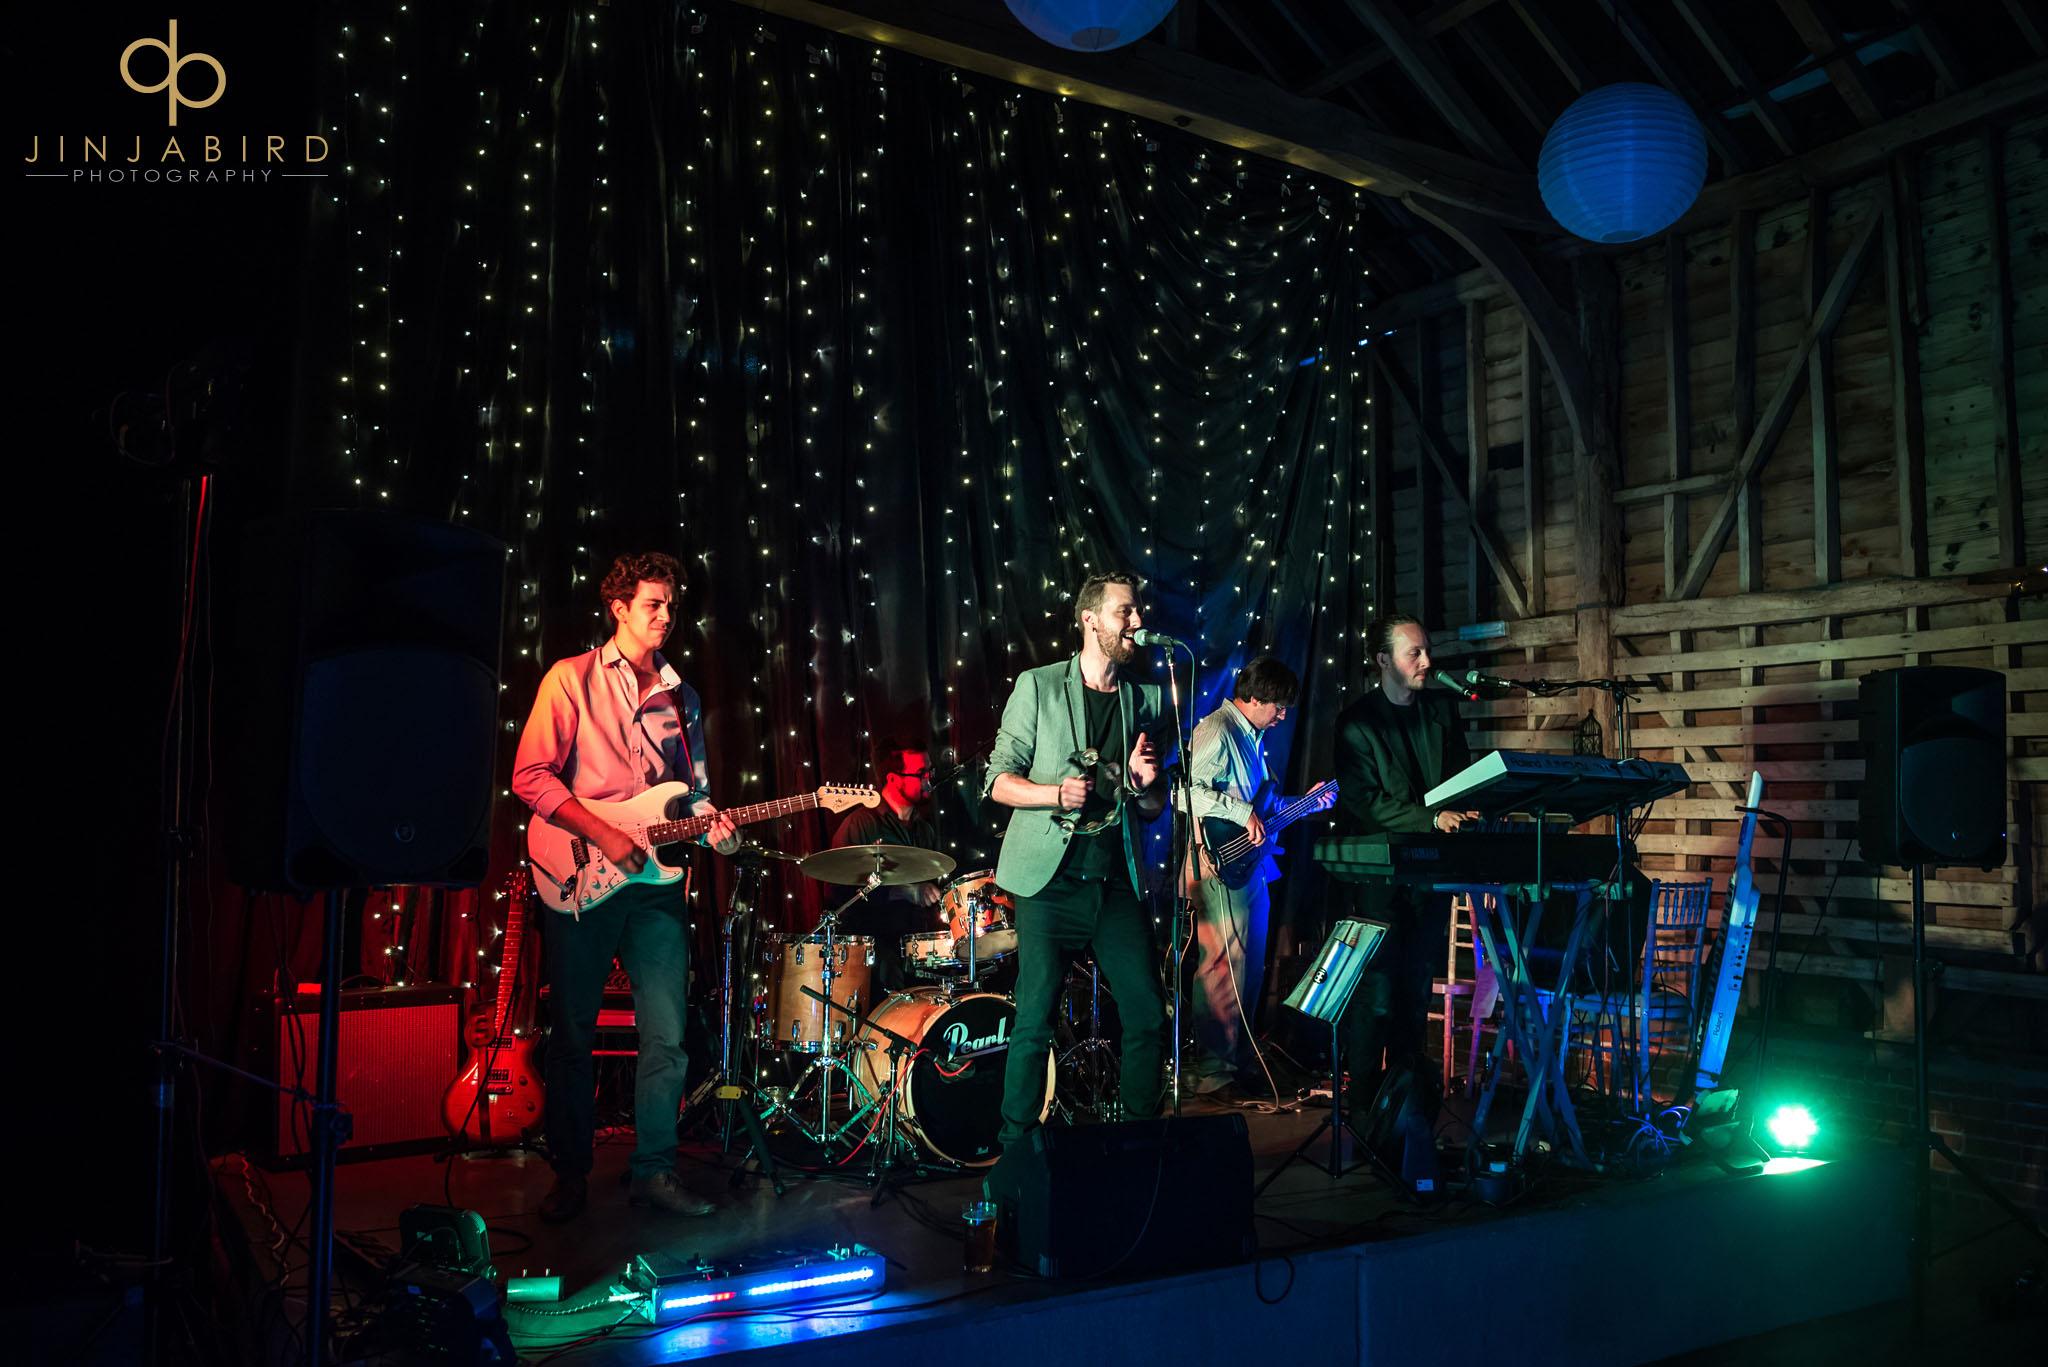 wedding band childerley hall